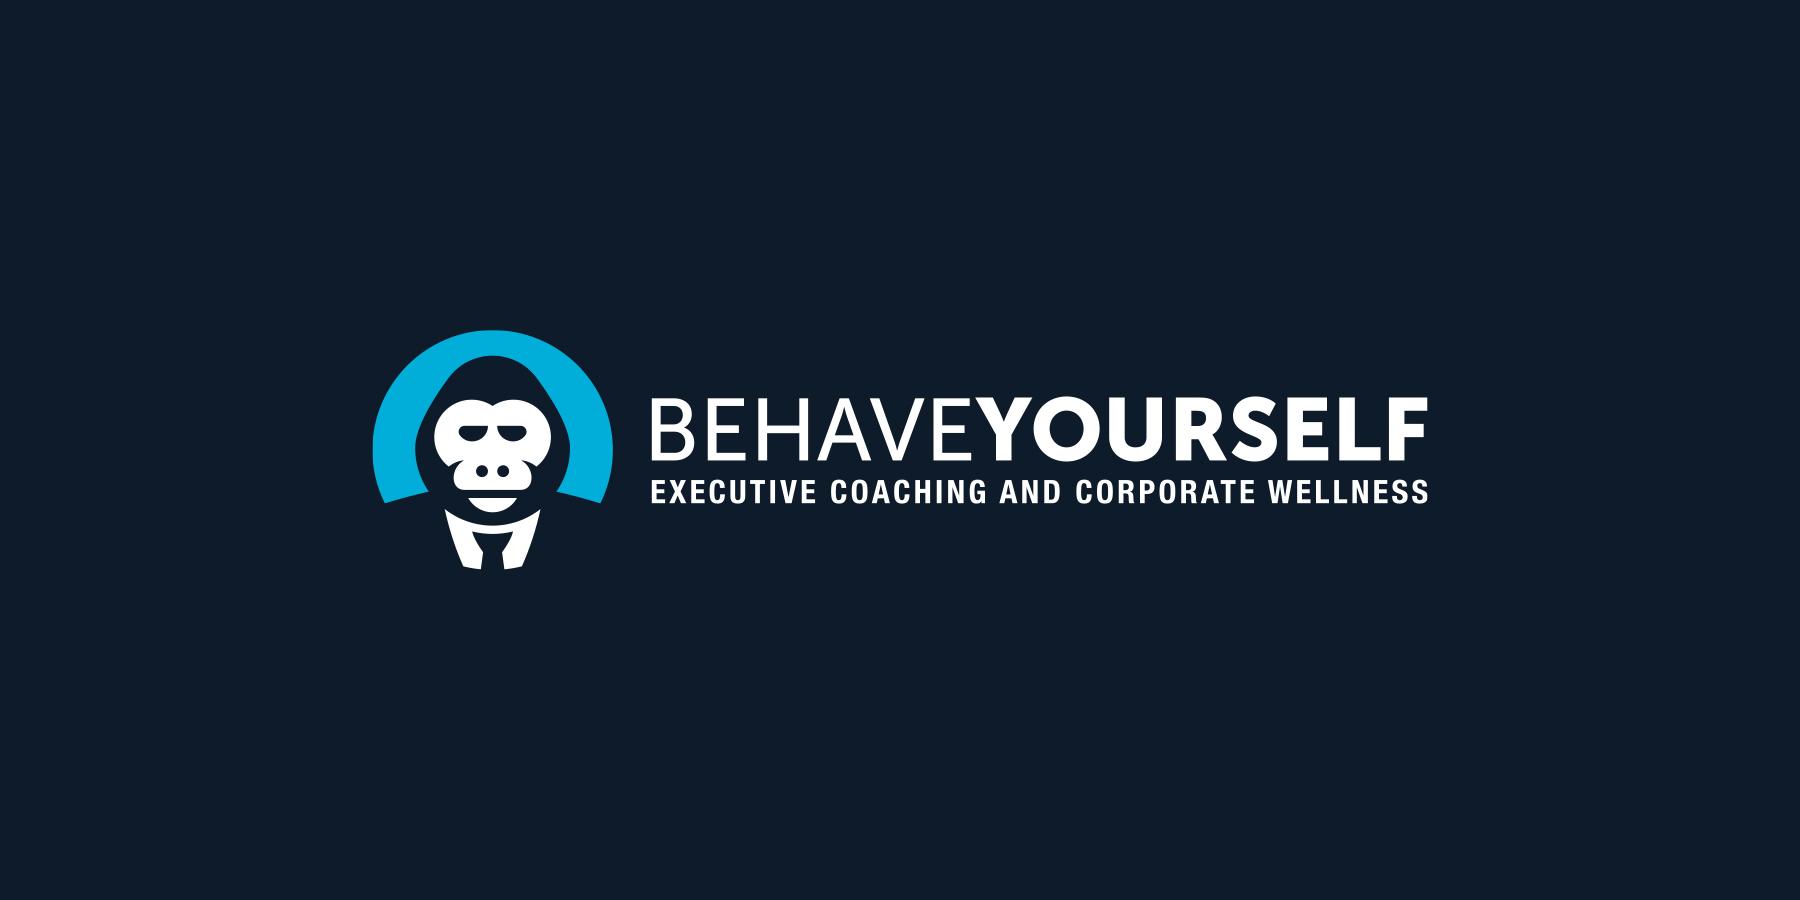 behave-yourself-logo-design-04